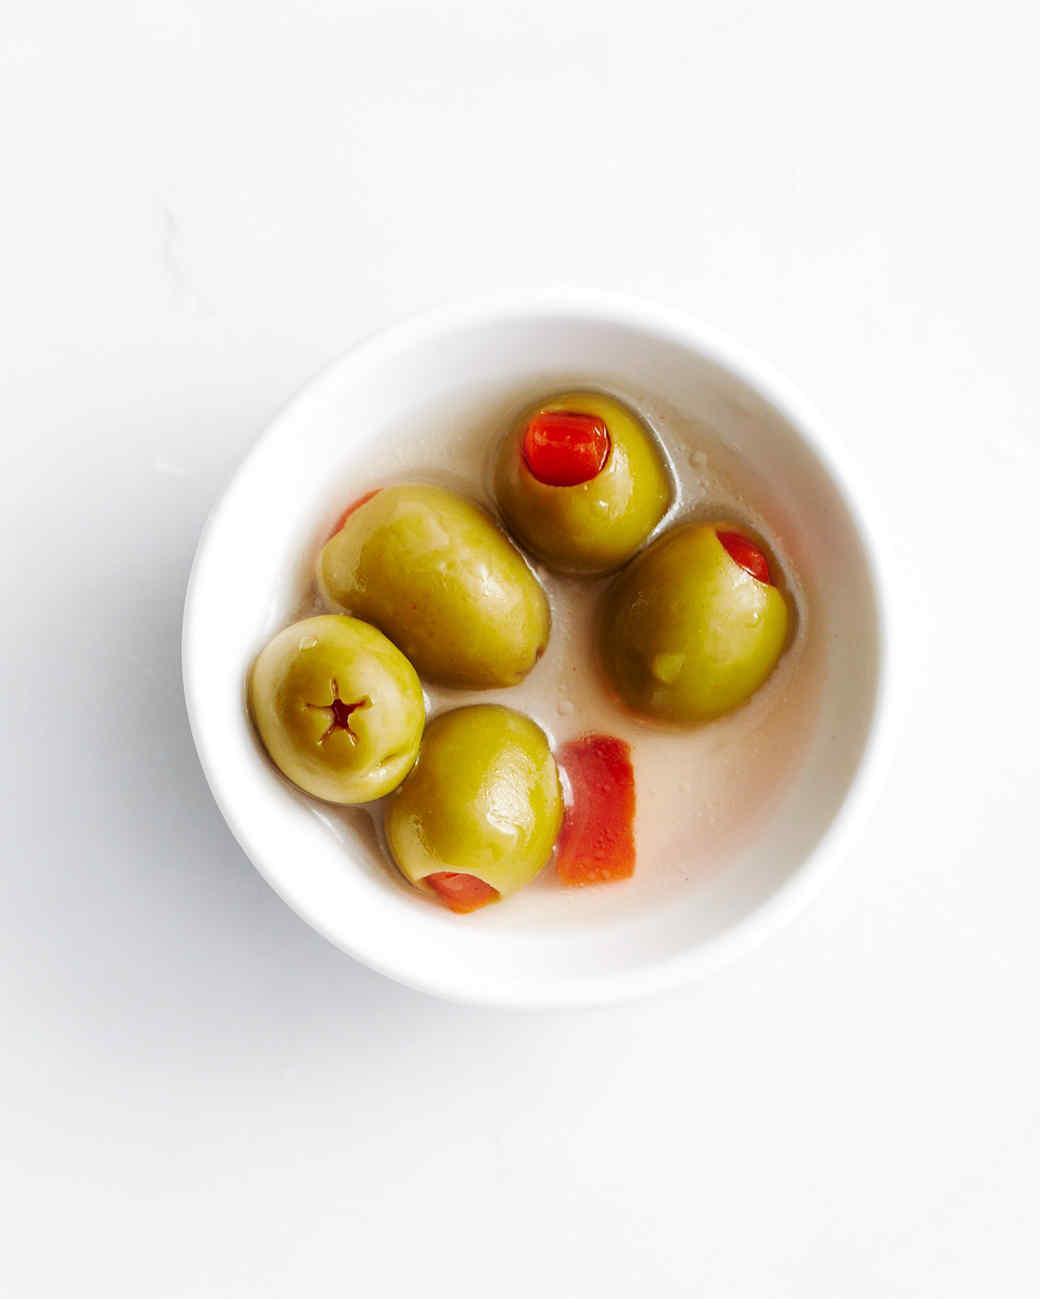 olive-ipad-manzanella-0089-ld110630-0614.jpg